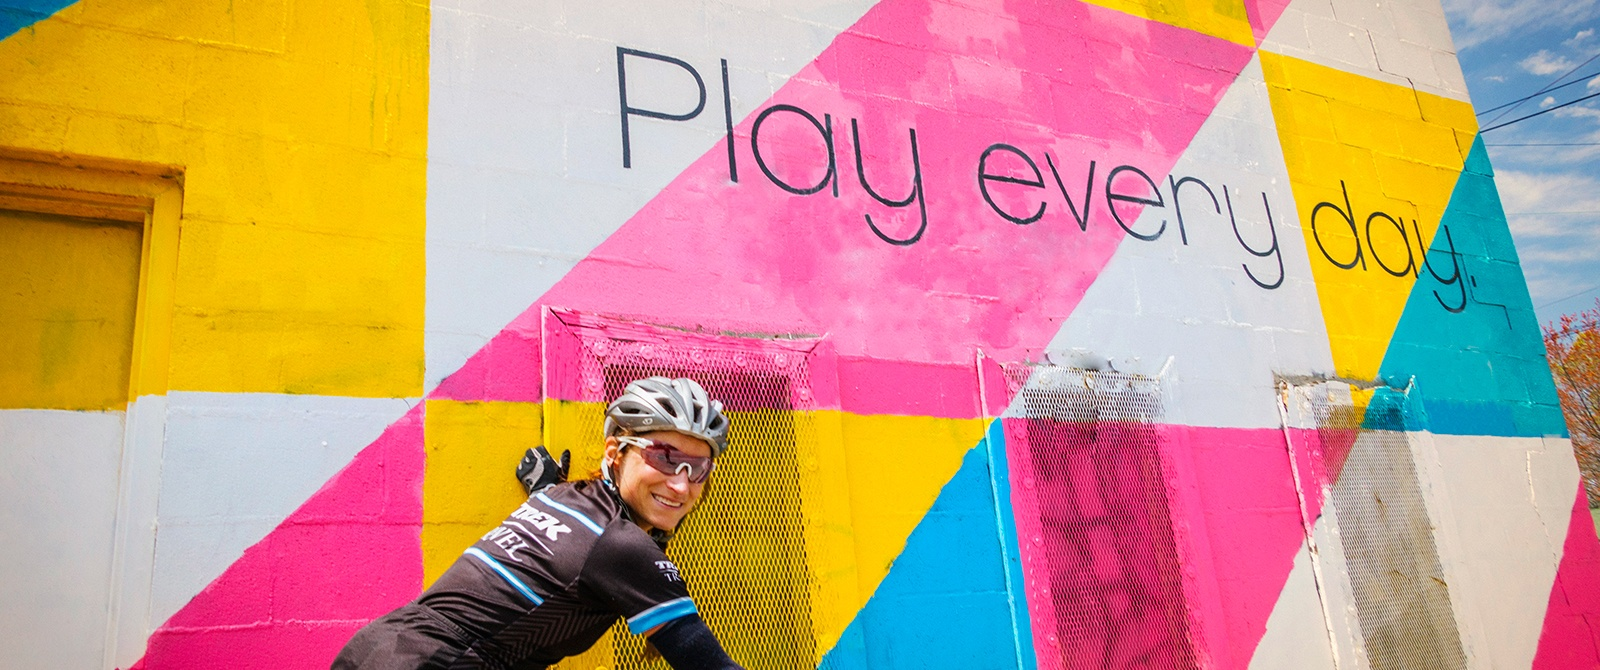 Trek Travel introduces brand new bike tours in 2017